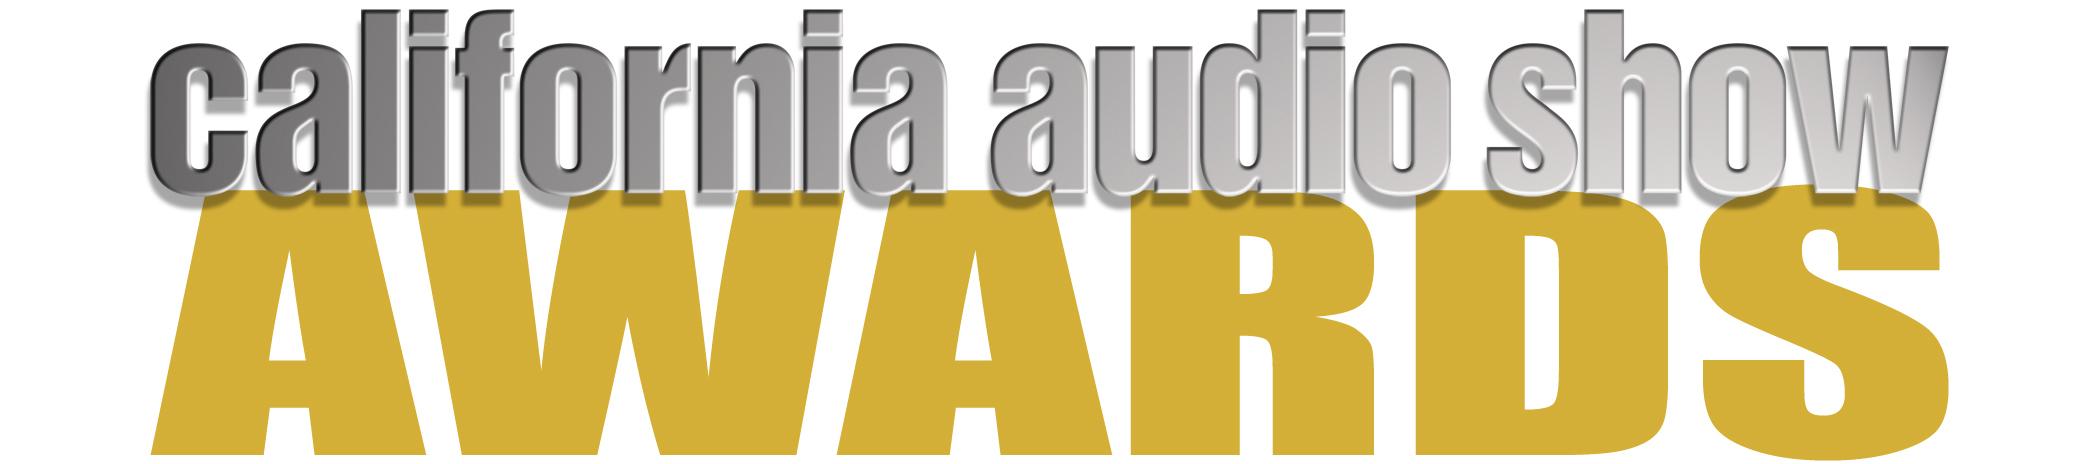 California Audio Show AWARDS